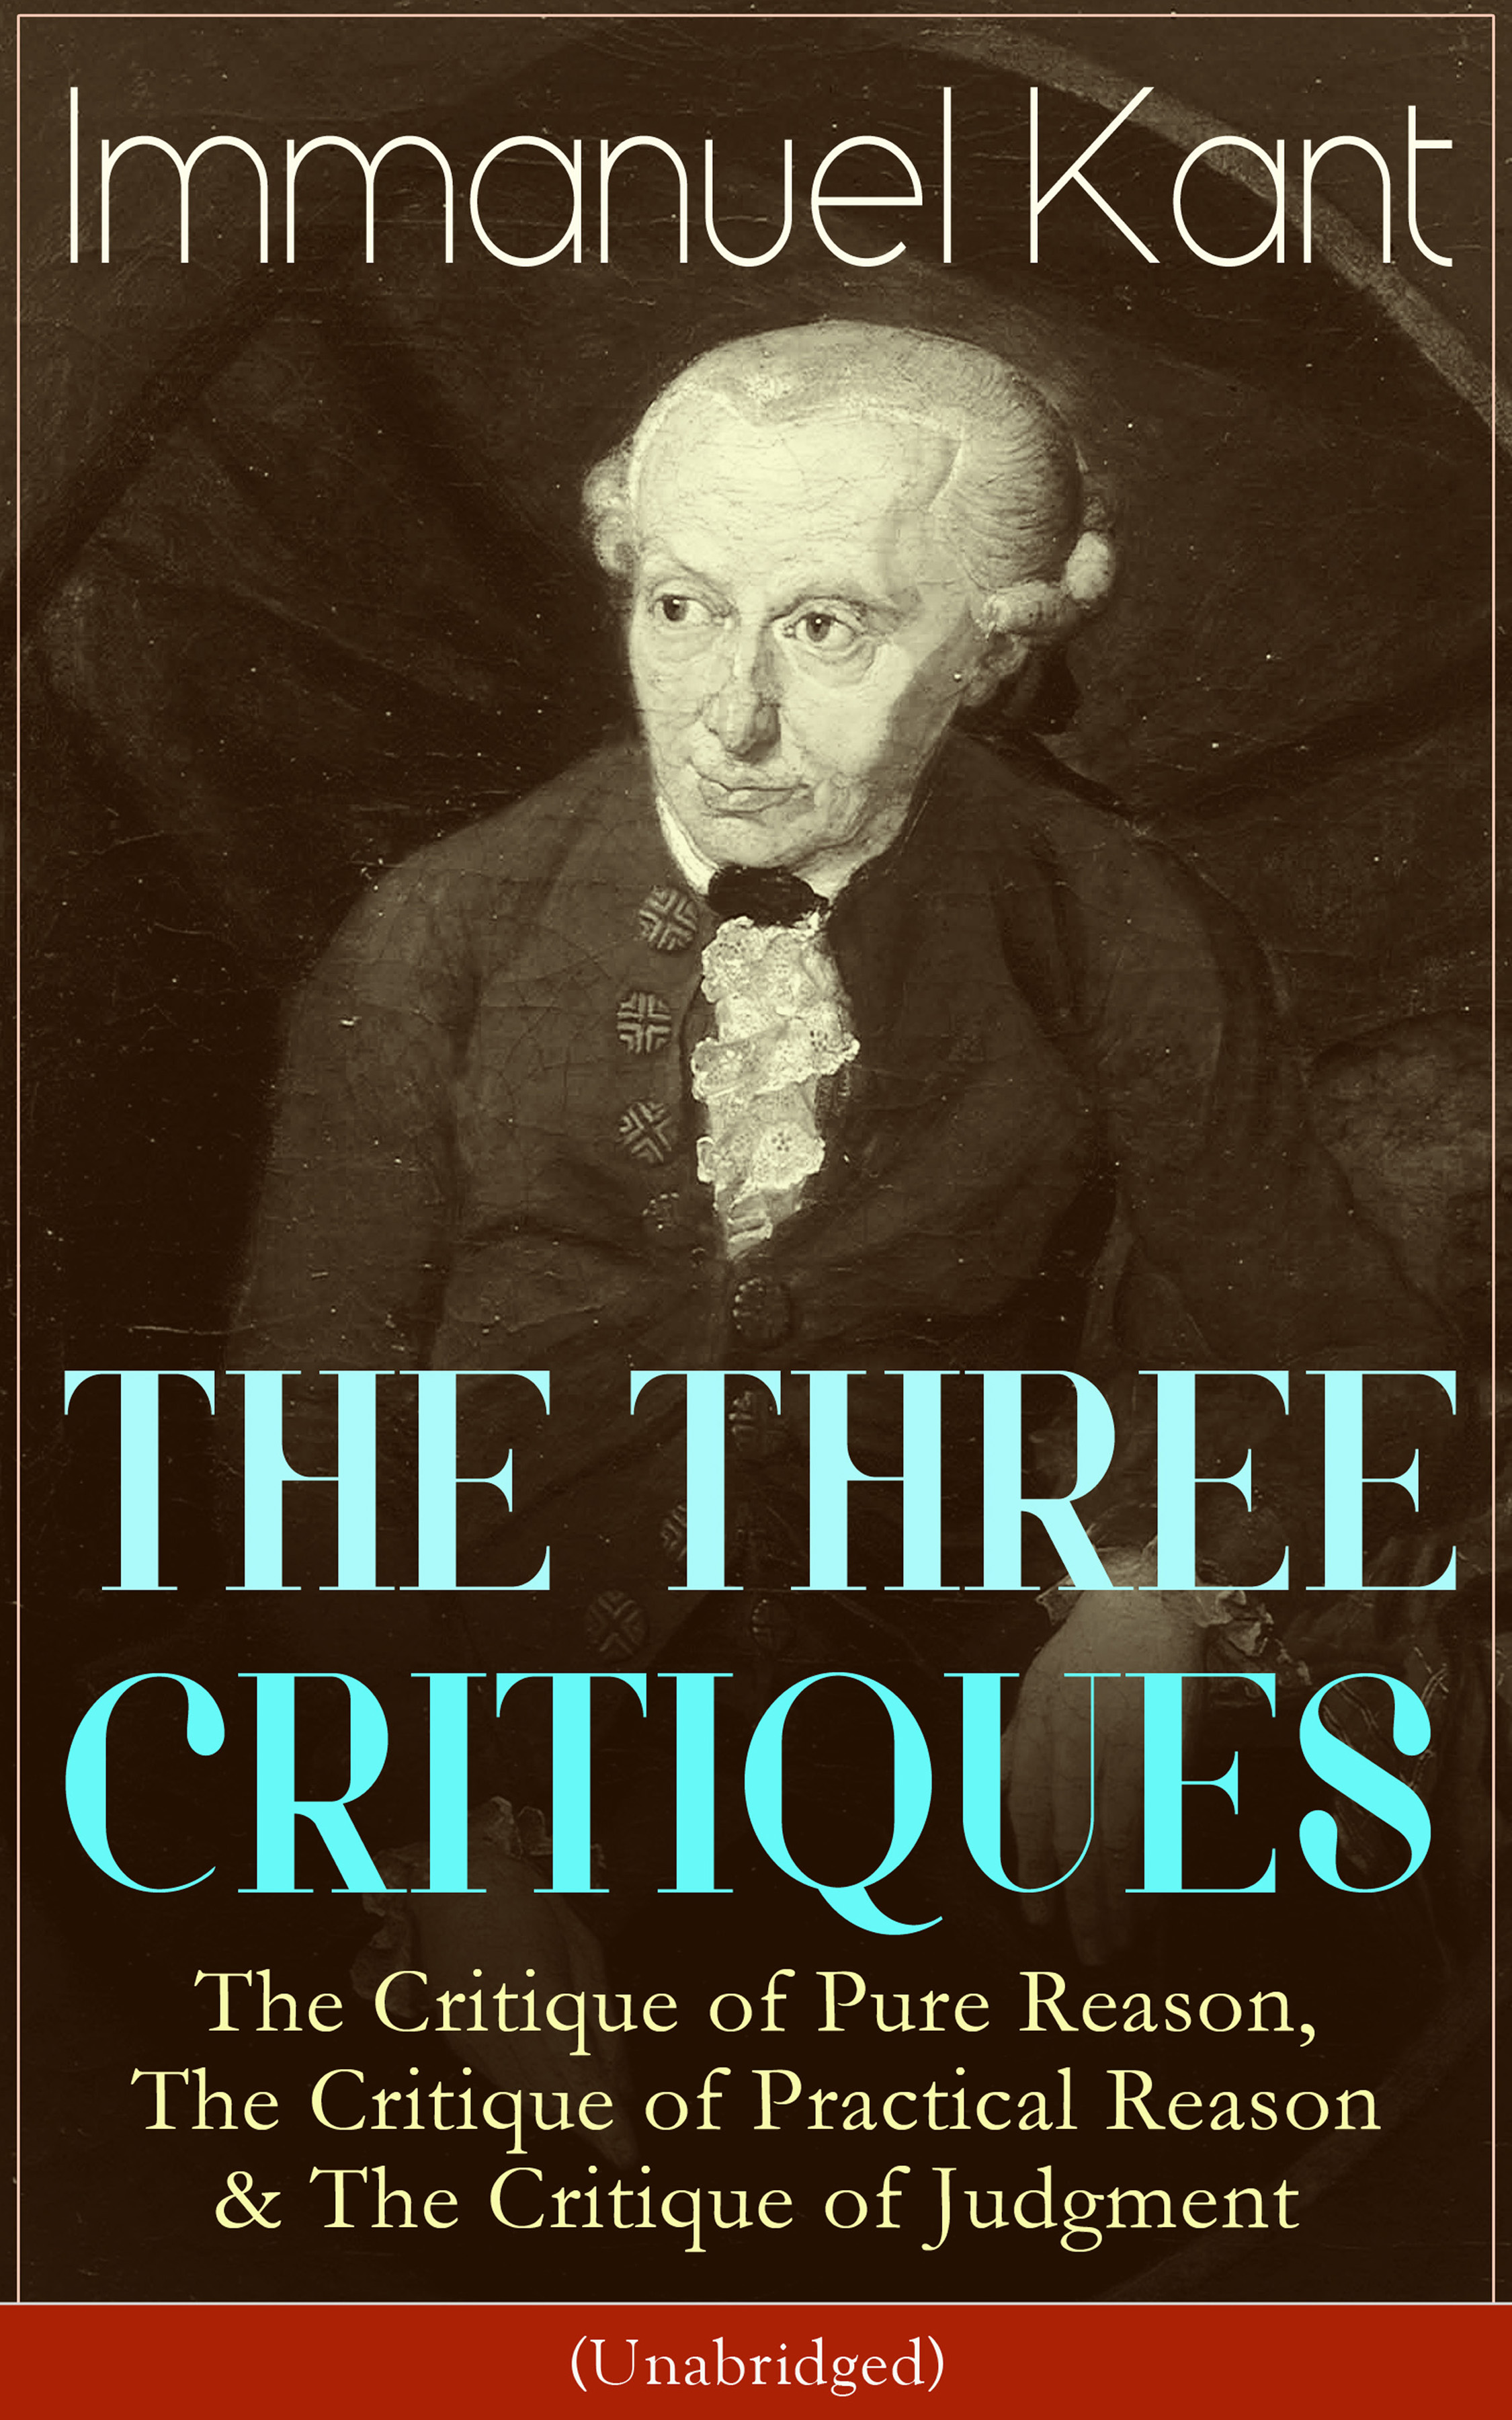 Immanuel Kant THE THREE CRITIQUES: The Critique of Pure Reason, The Critique of Practical Reason & The Critique of Judgment (Unabridged) reconstructing a pedagogical framework for critique sessions